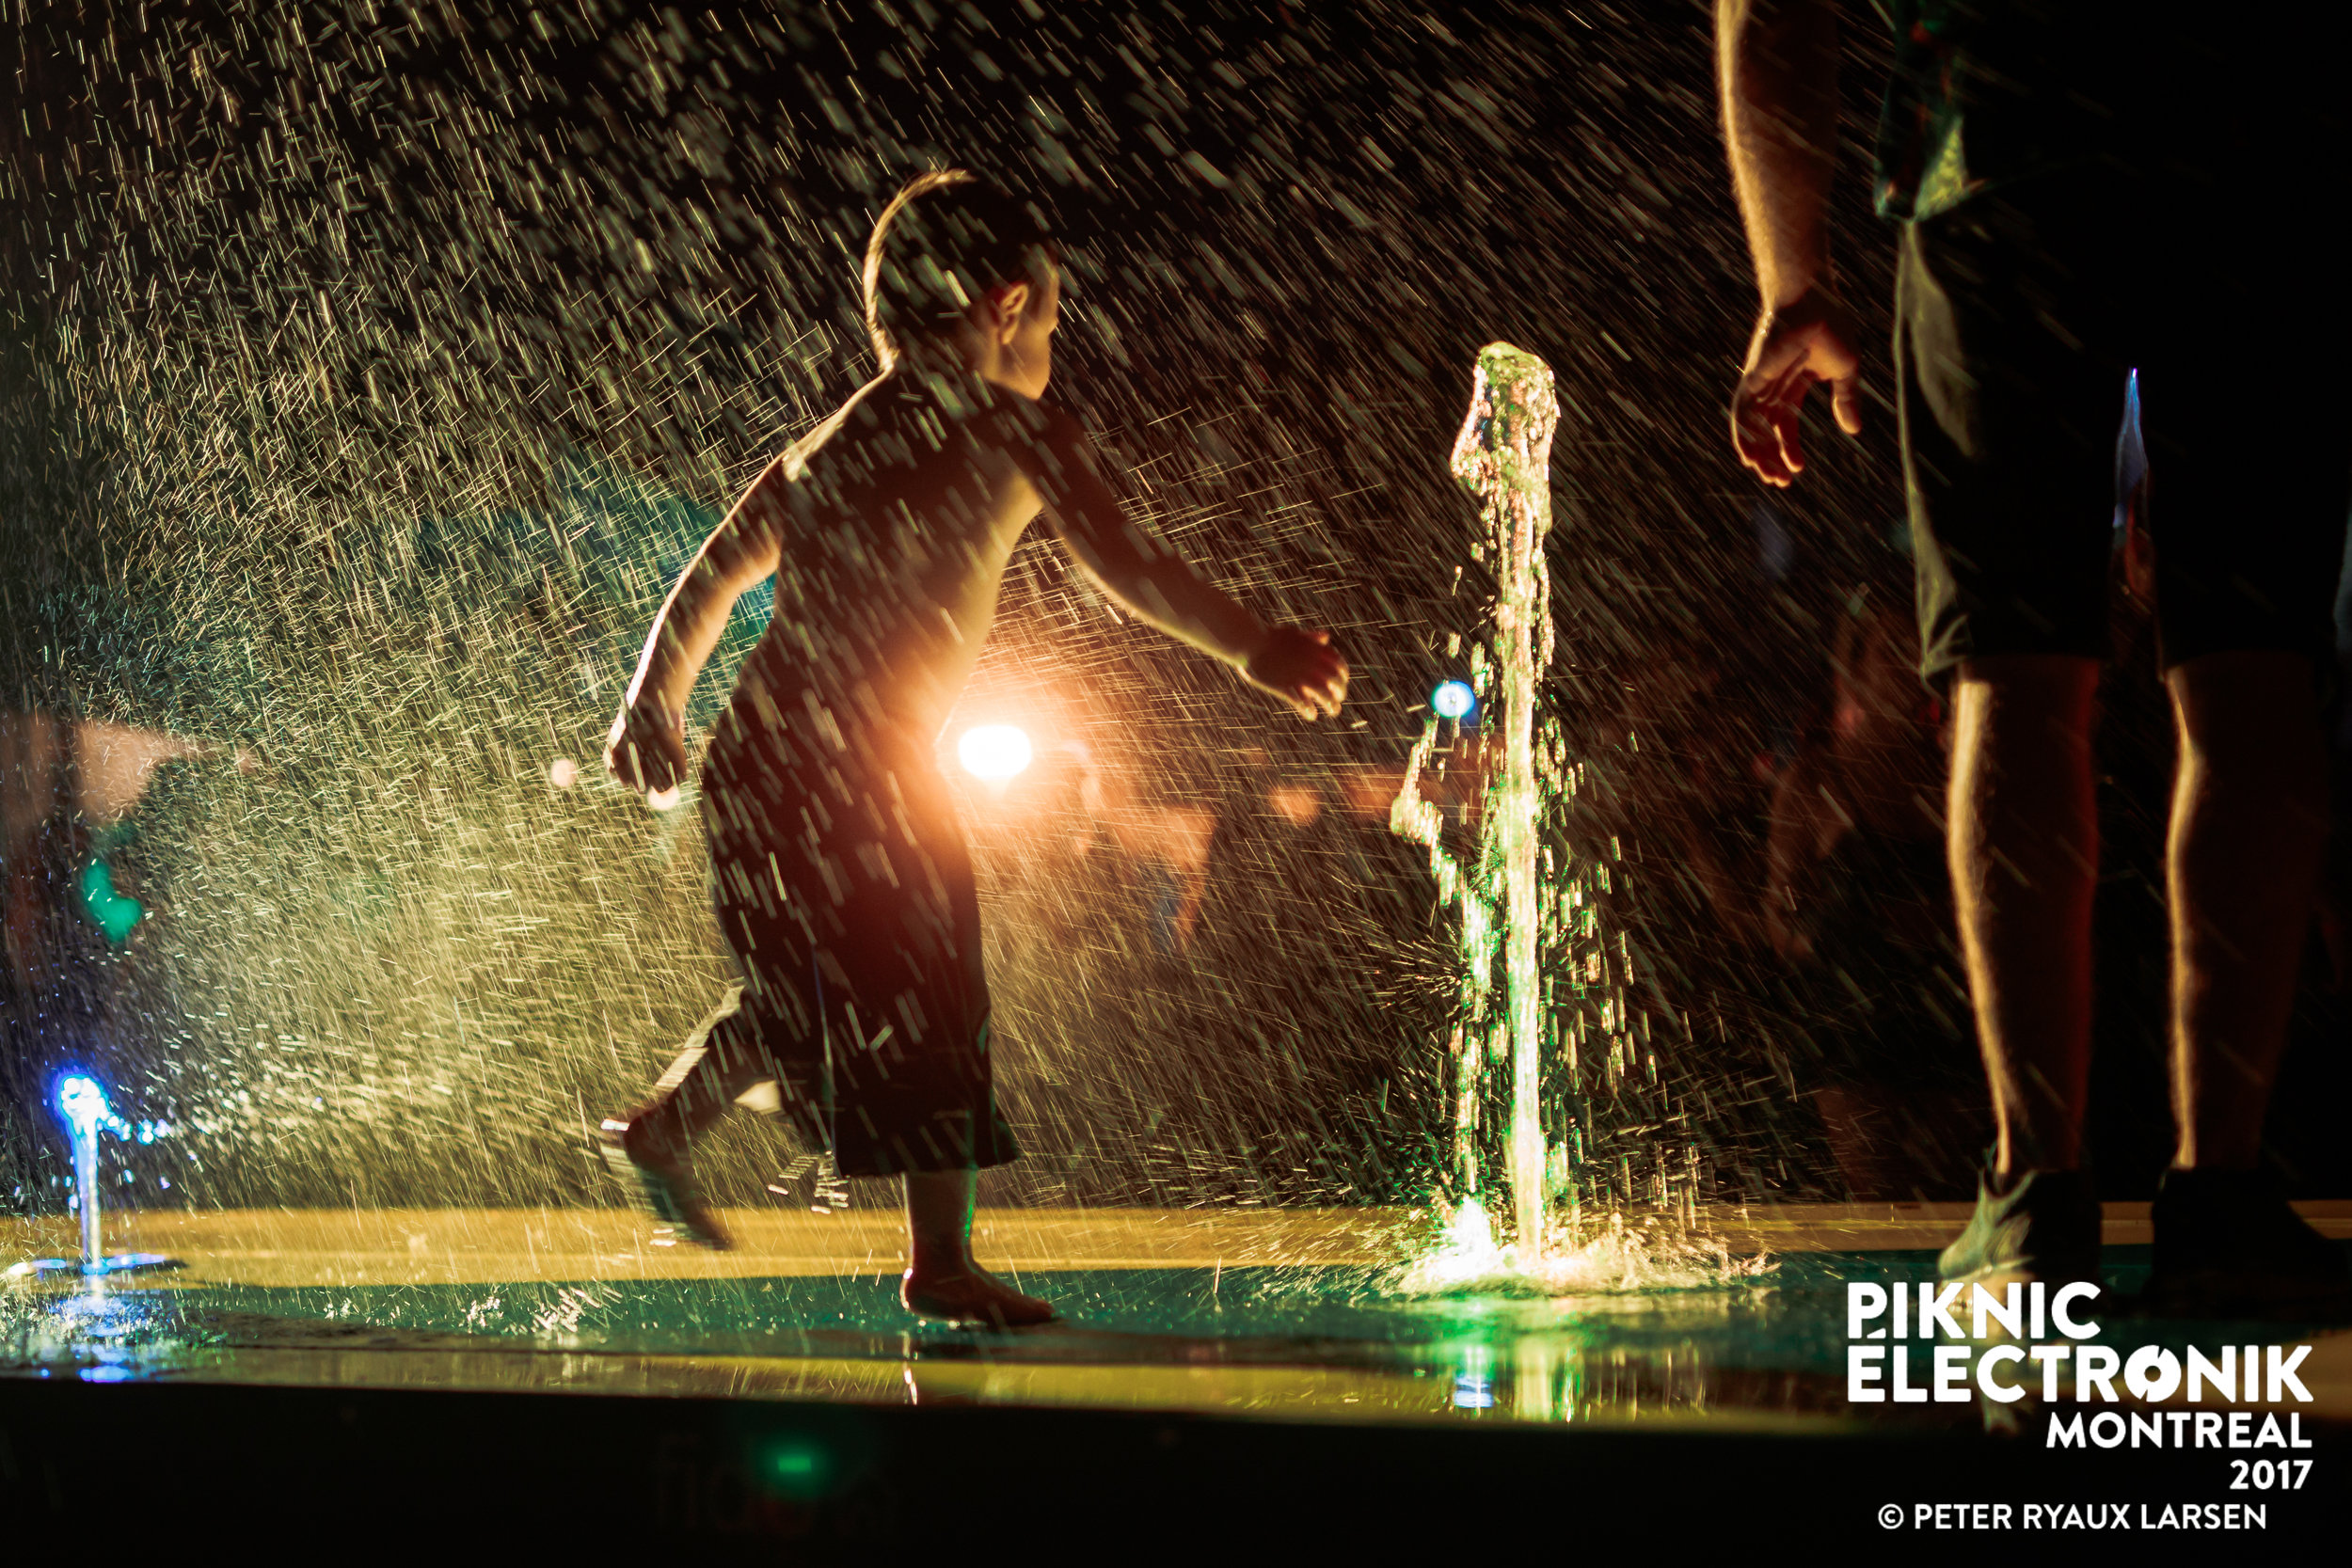 Piknic Electronik #19 - 105 - 20170924 - 1264.jpg